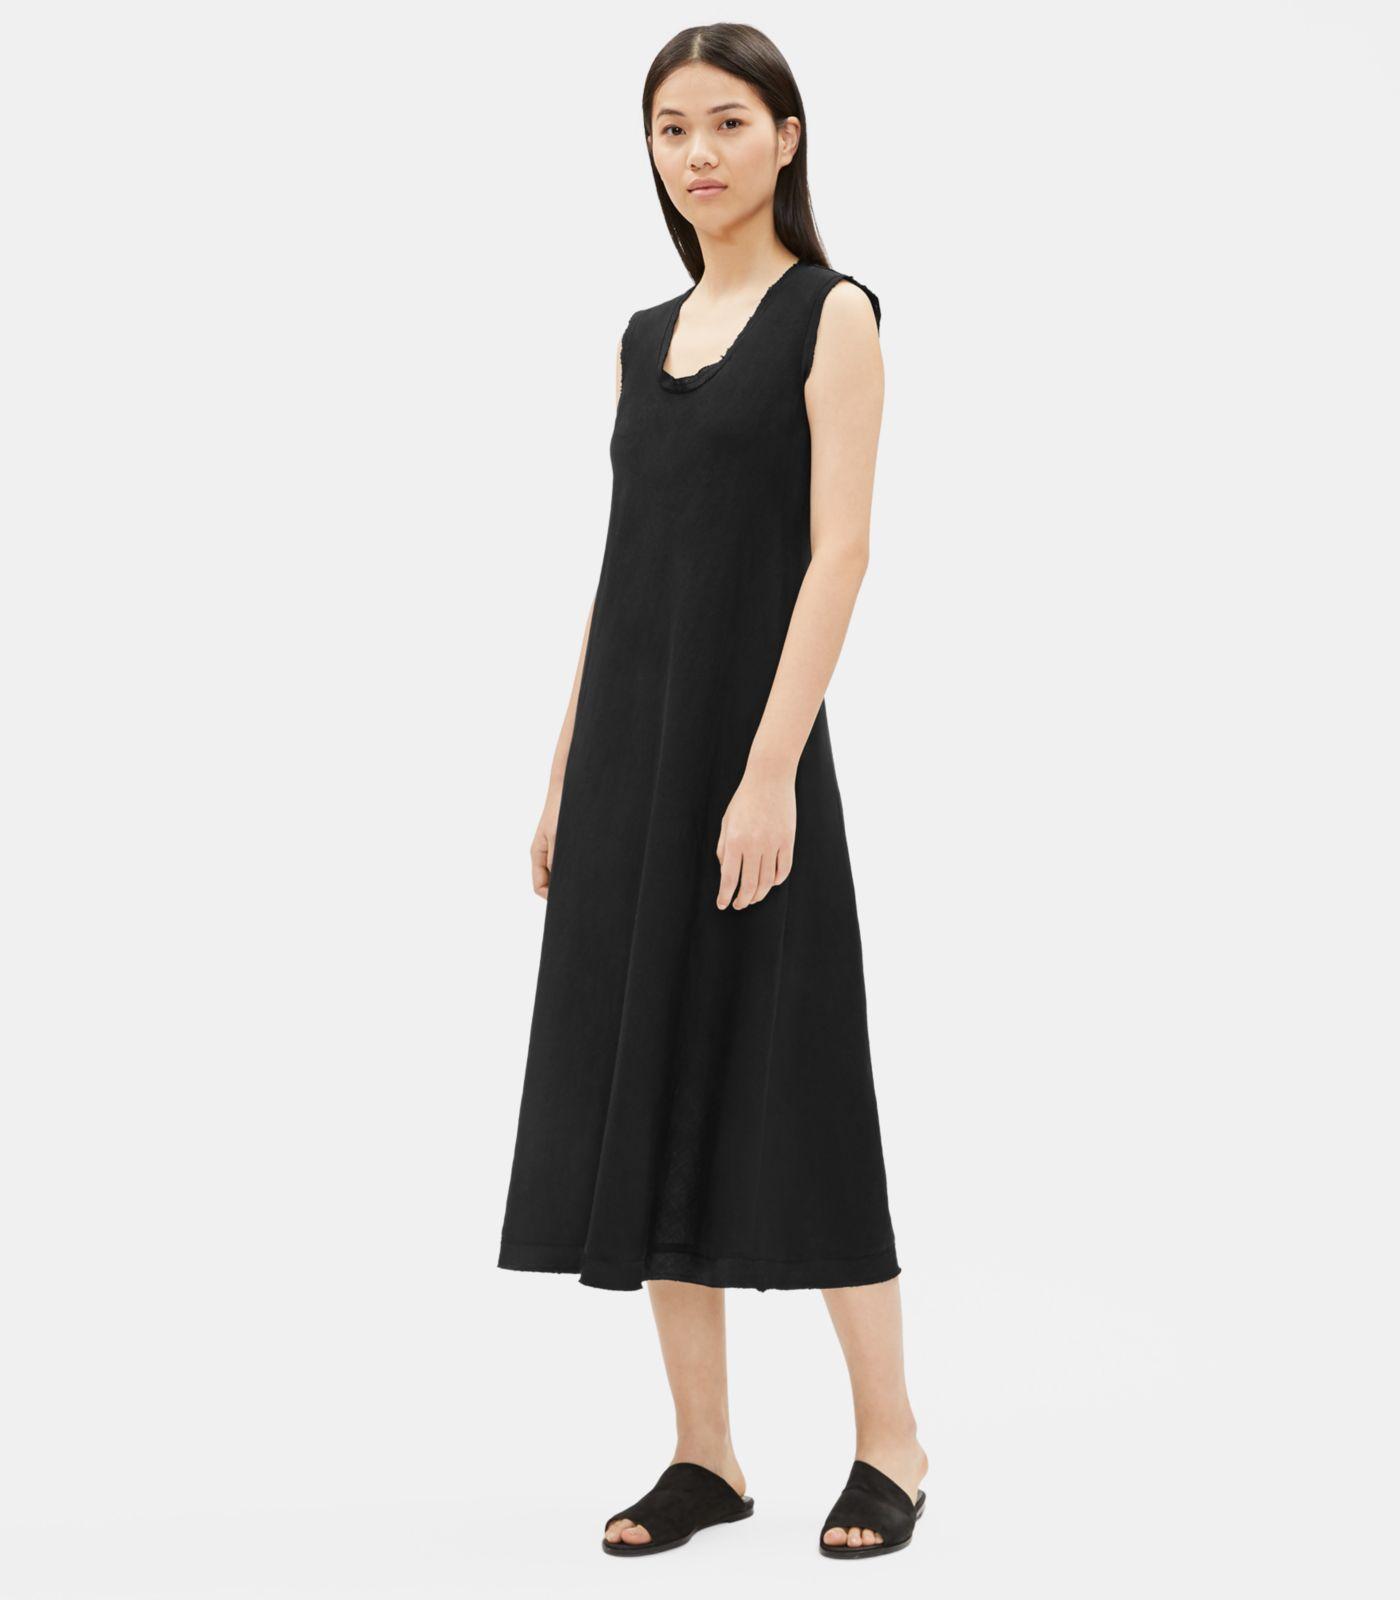 031d0f05ff Lyst - Eileen Fisher Organic Handkerchief Linen Raw-edge Dress in Black